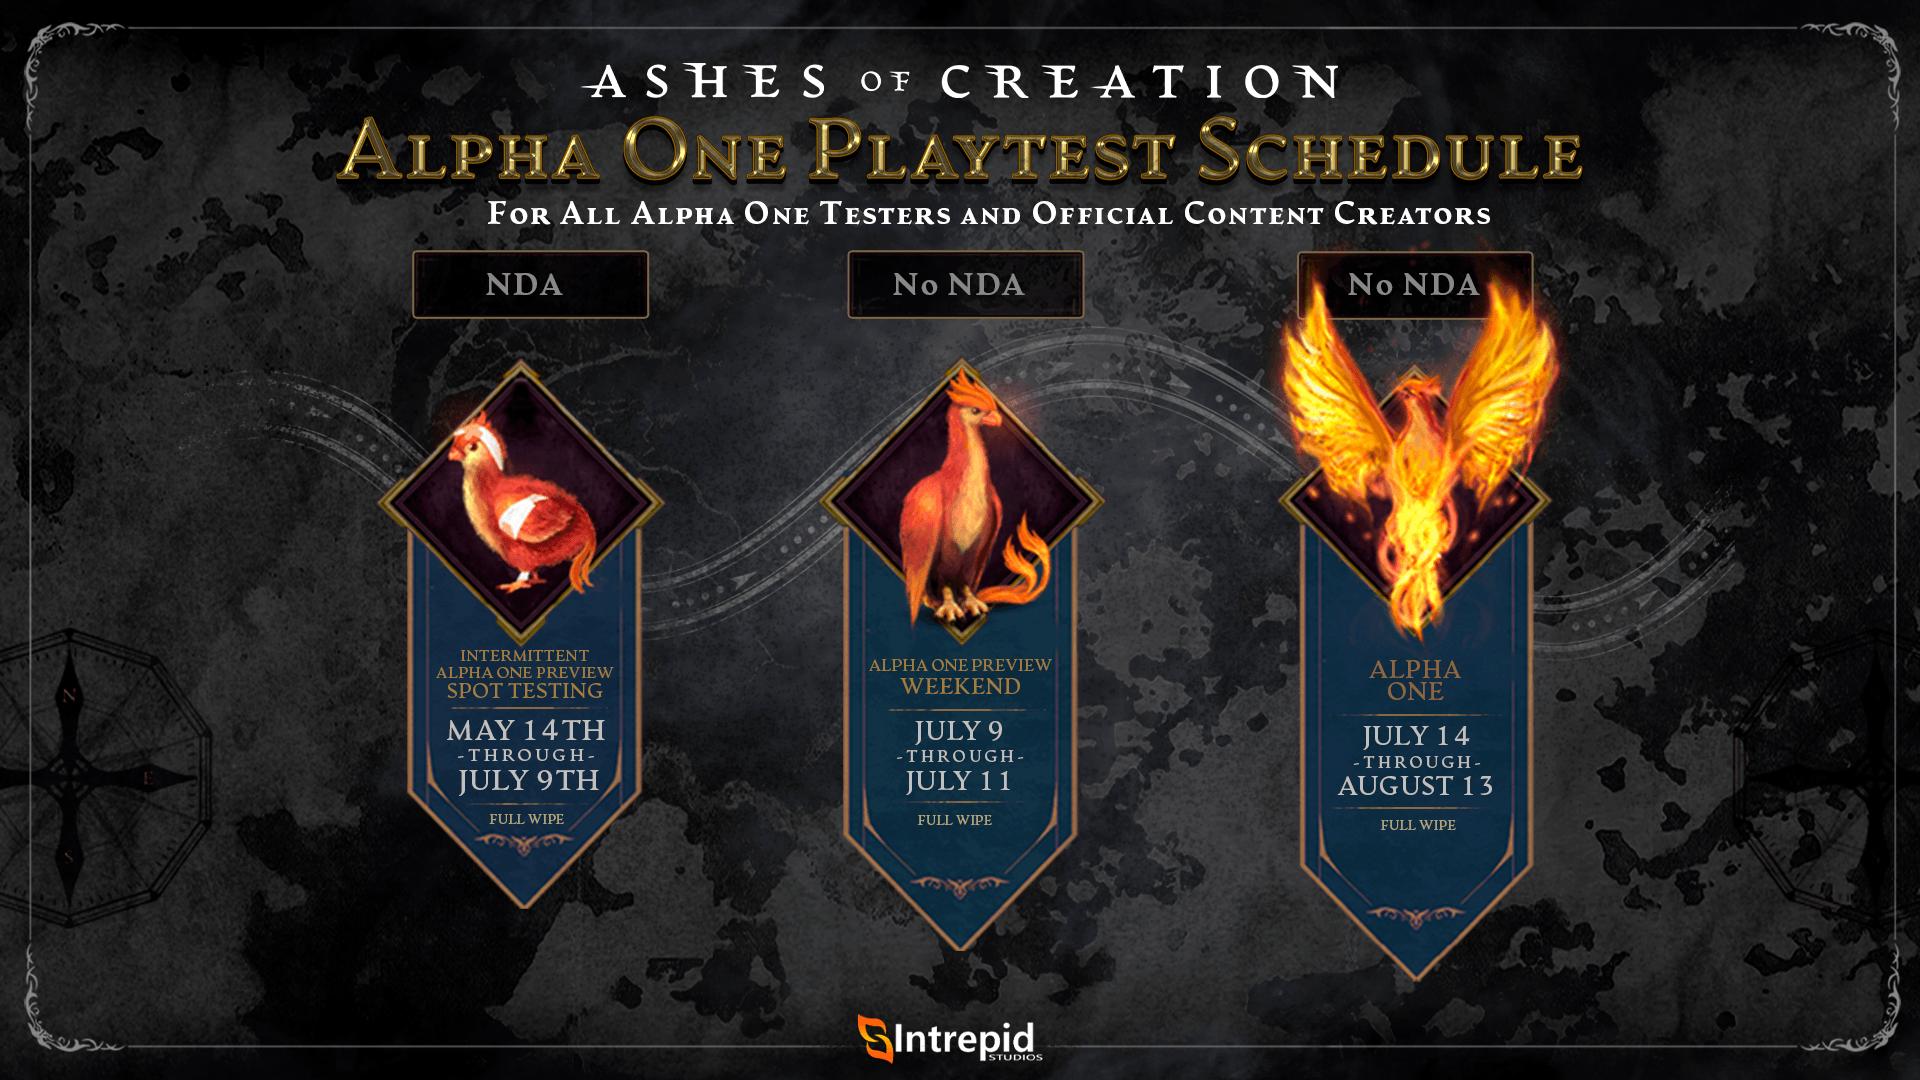 fechas test alfa 1 ashes of creation